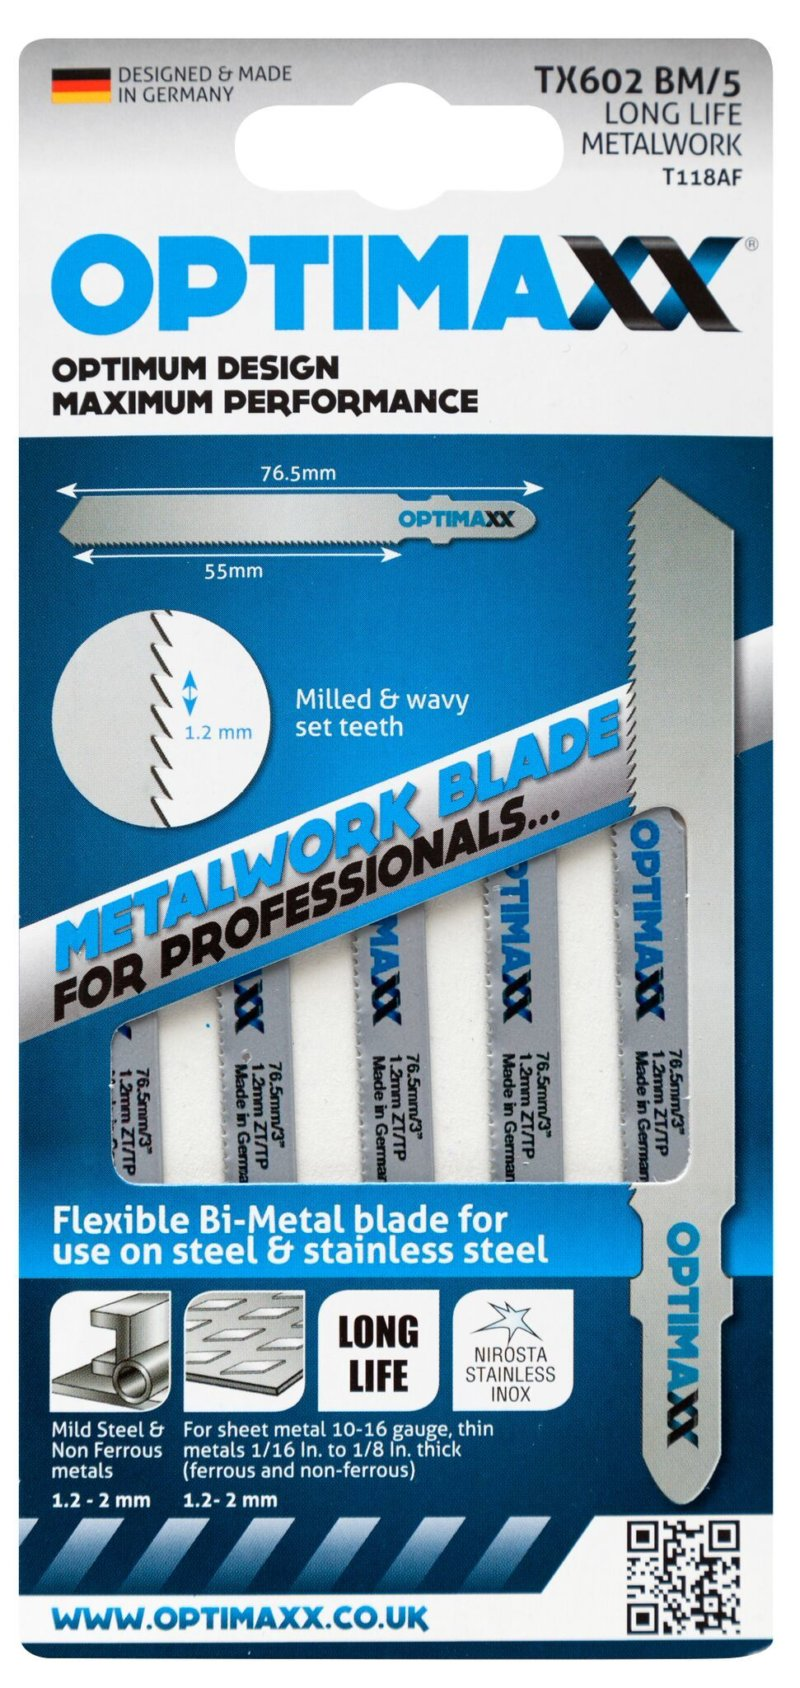 Optimaxx TX602BM Jigsaw blade for sheet metal - long life Bi-metal blade - Pack of 5